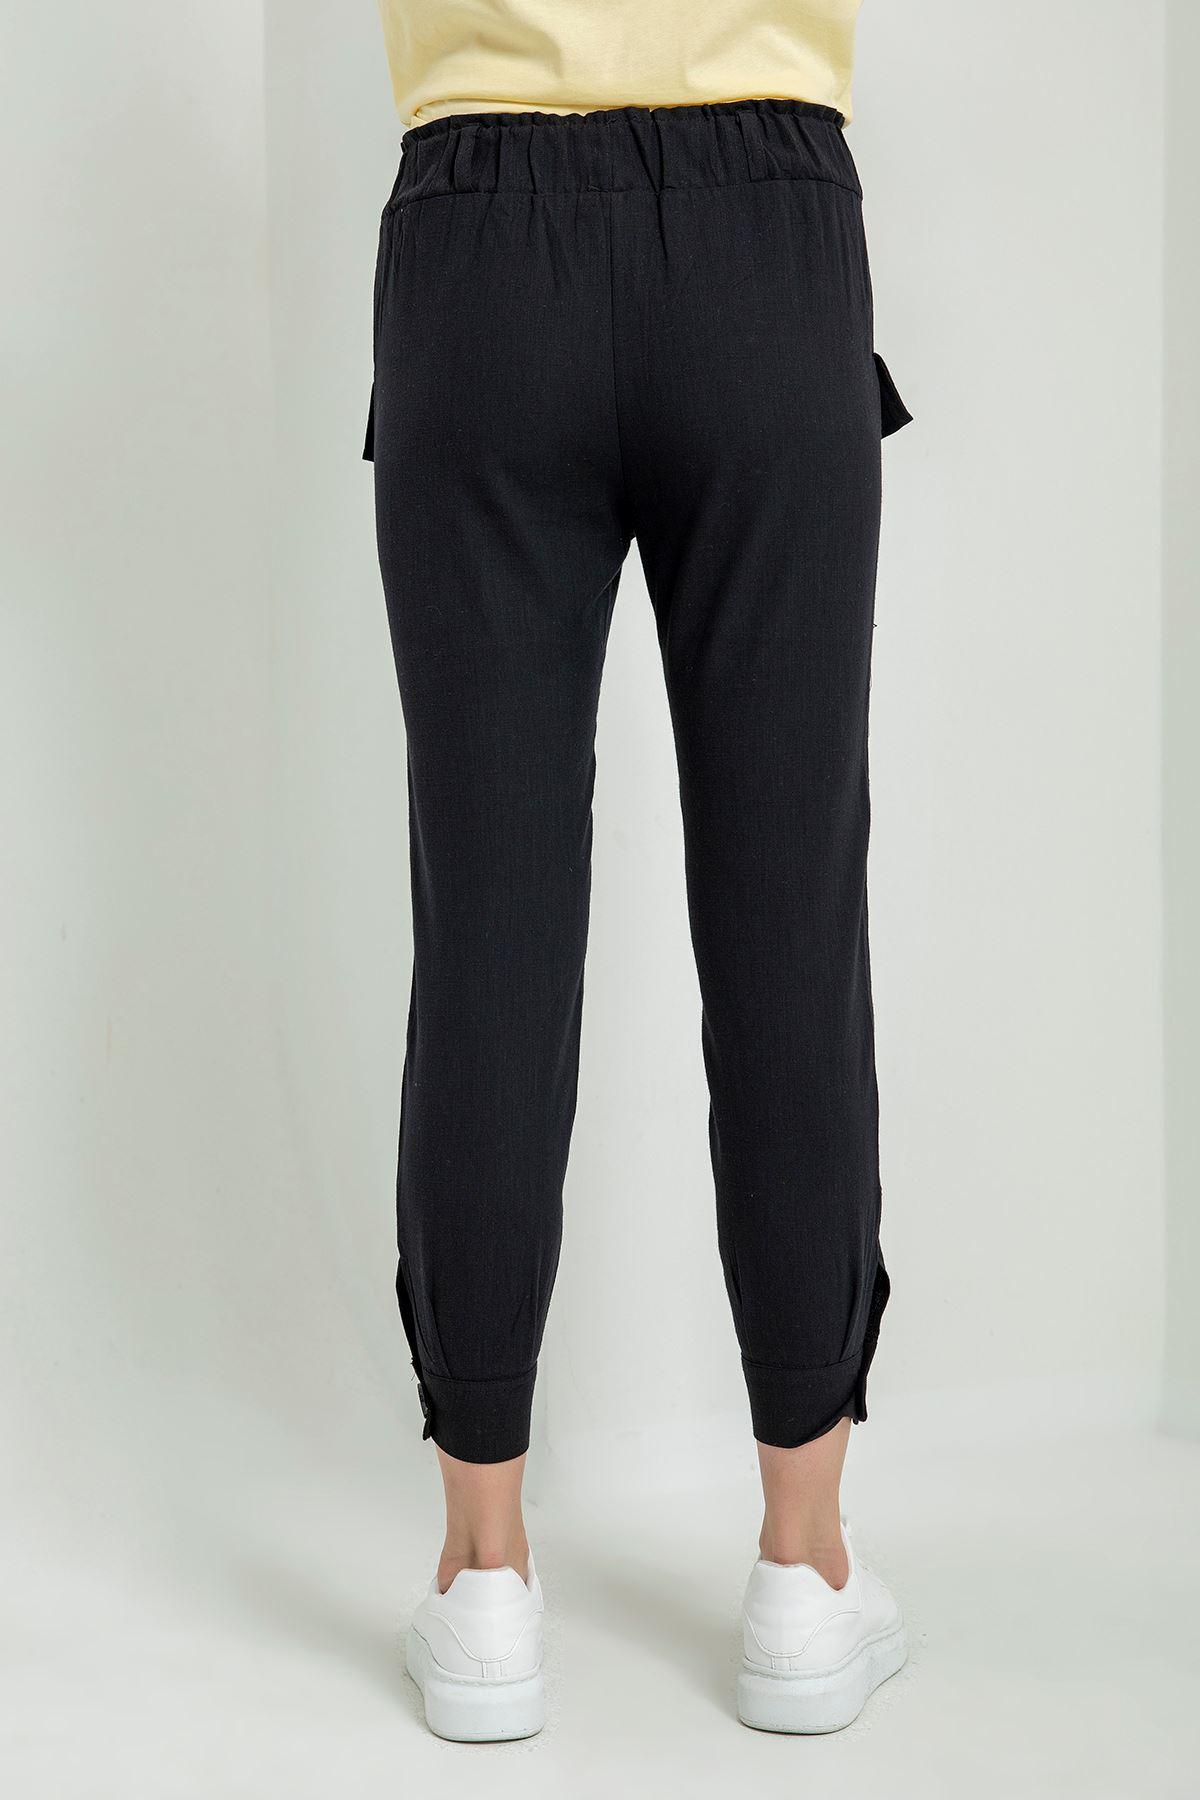 Beli Lastikli Keten Pantolon-Siyah